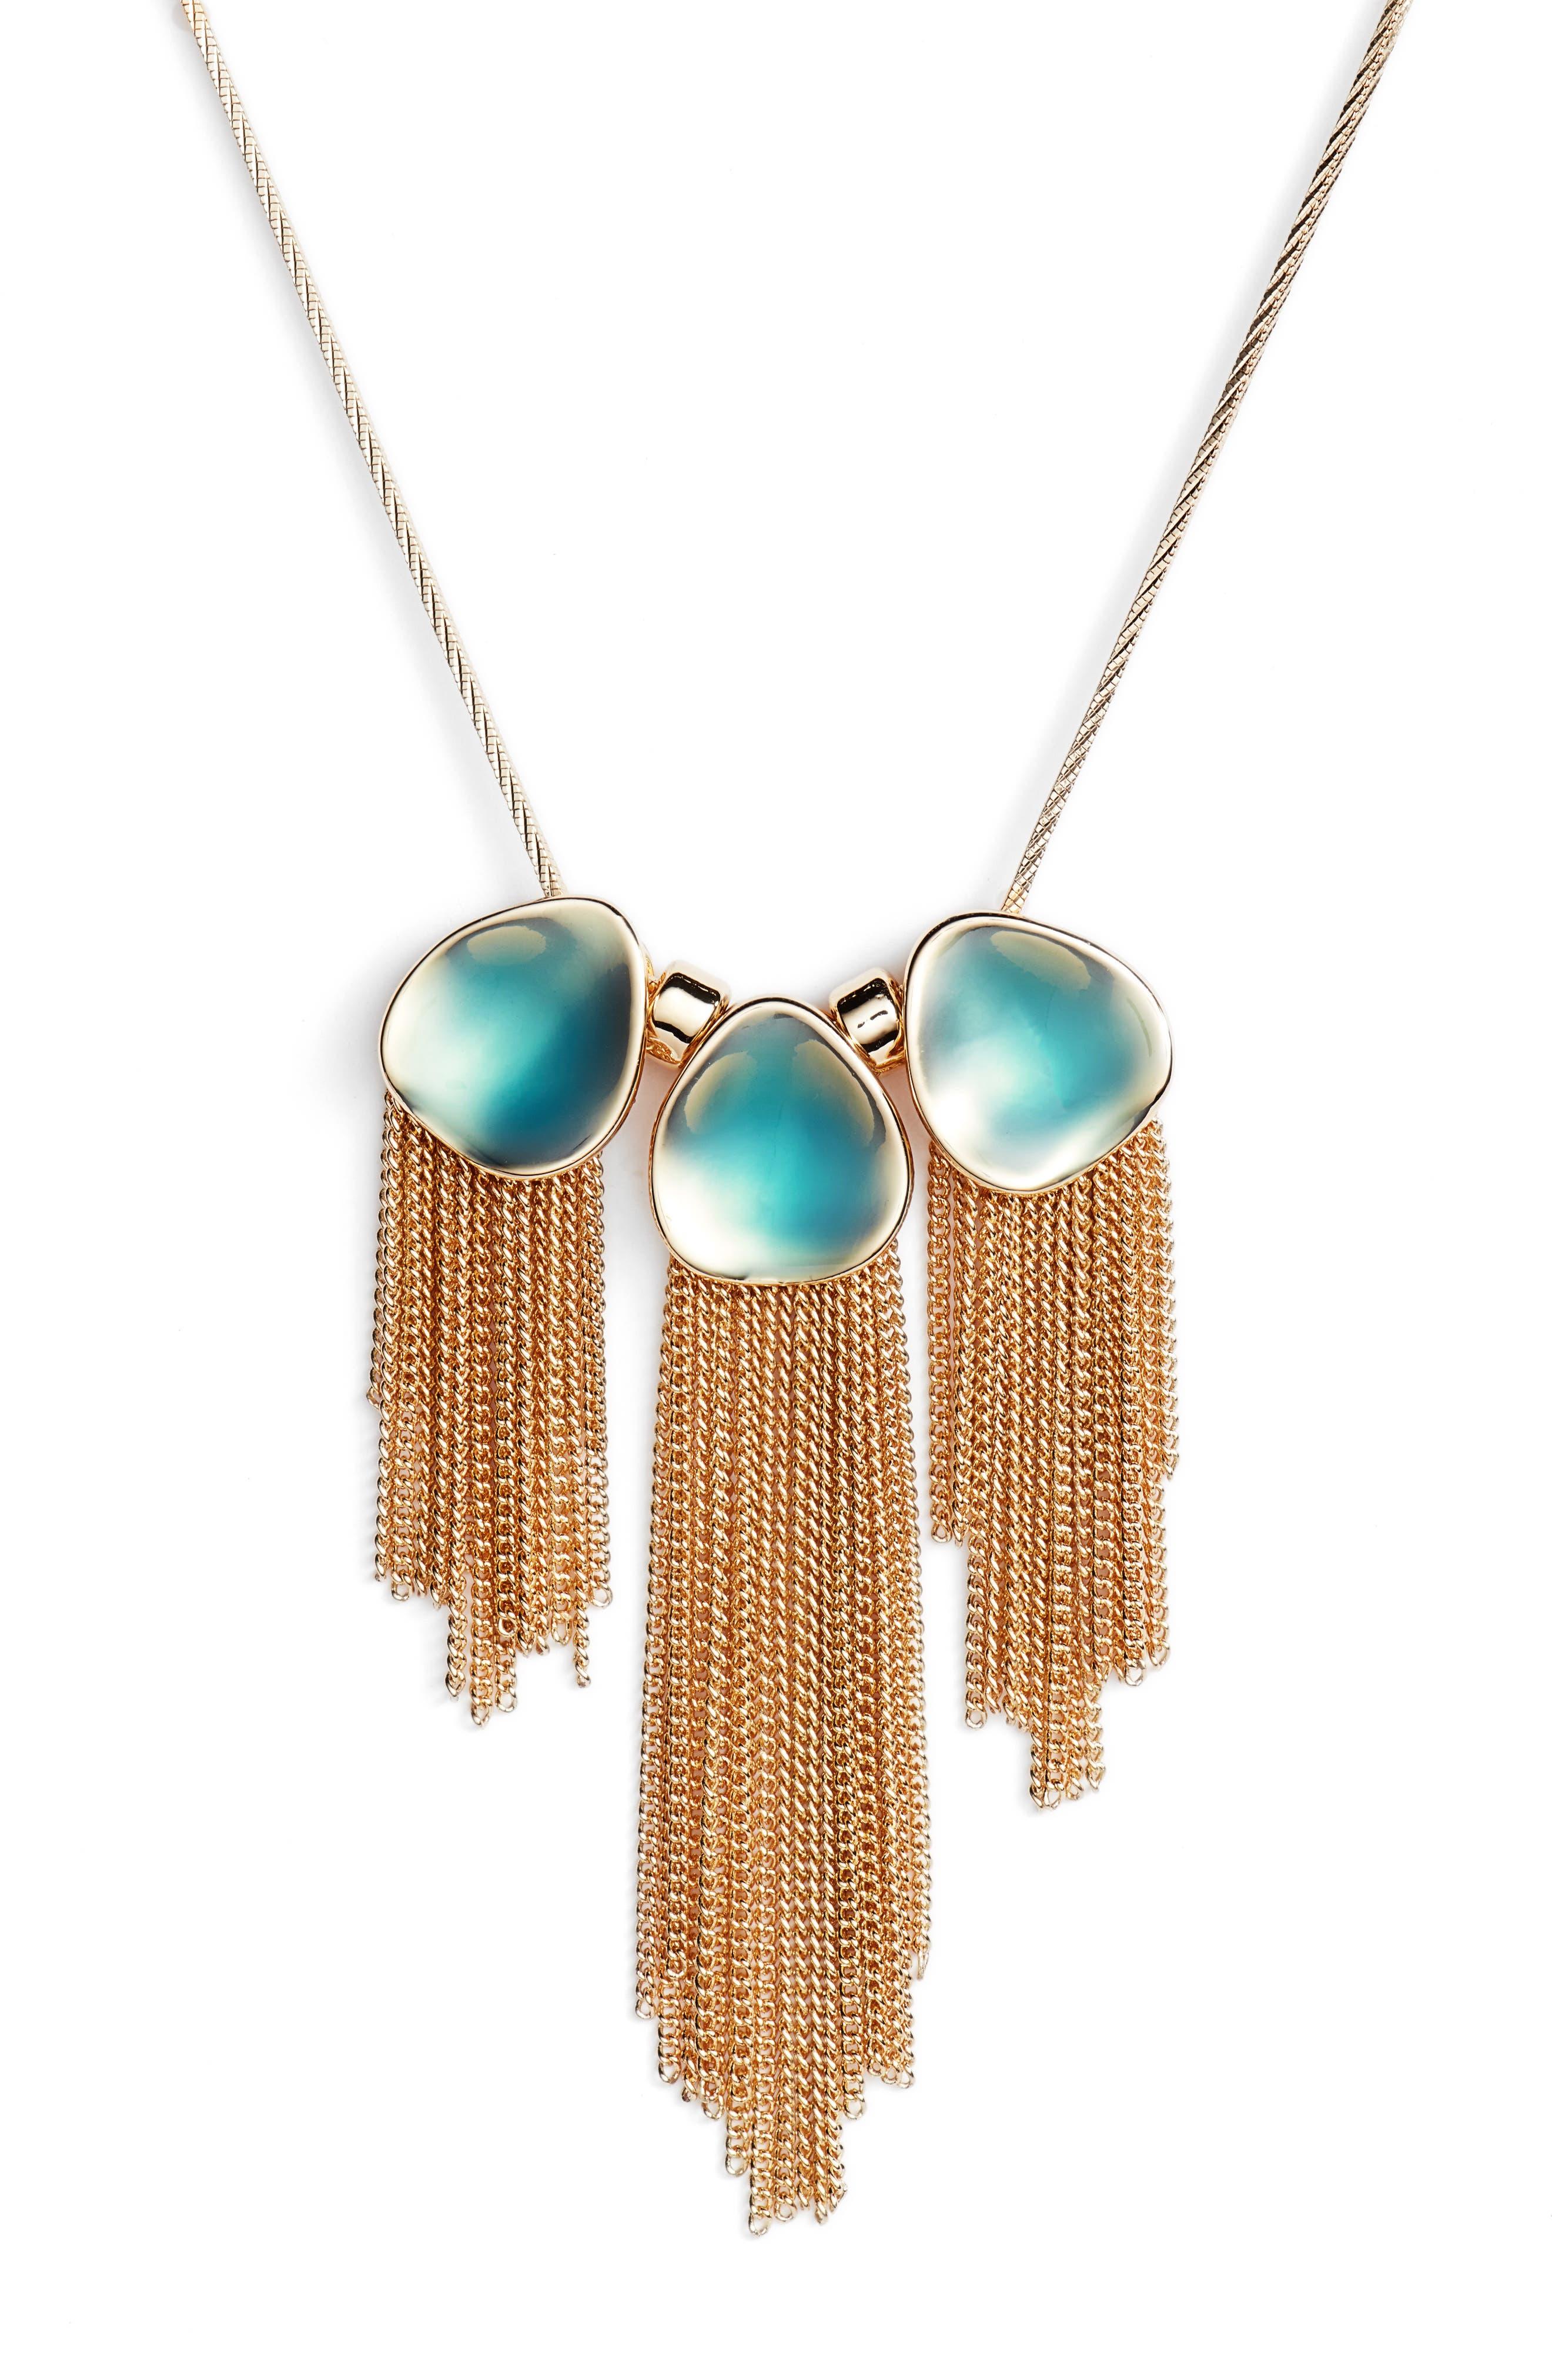 Painted Petal Fringe Necklace,                         Main,                         color, Teal- Gold